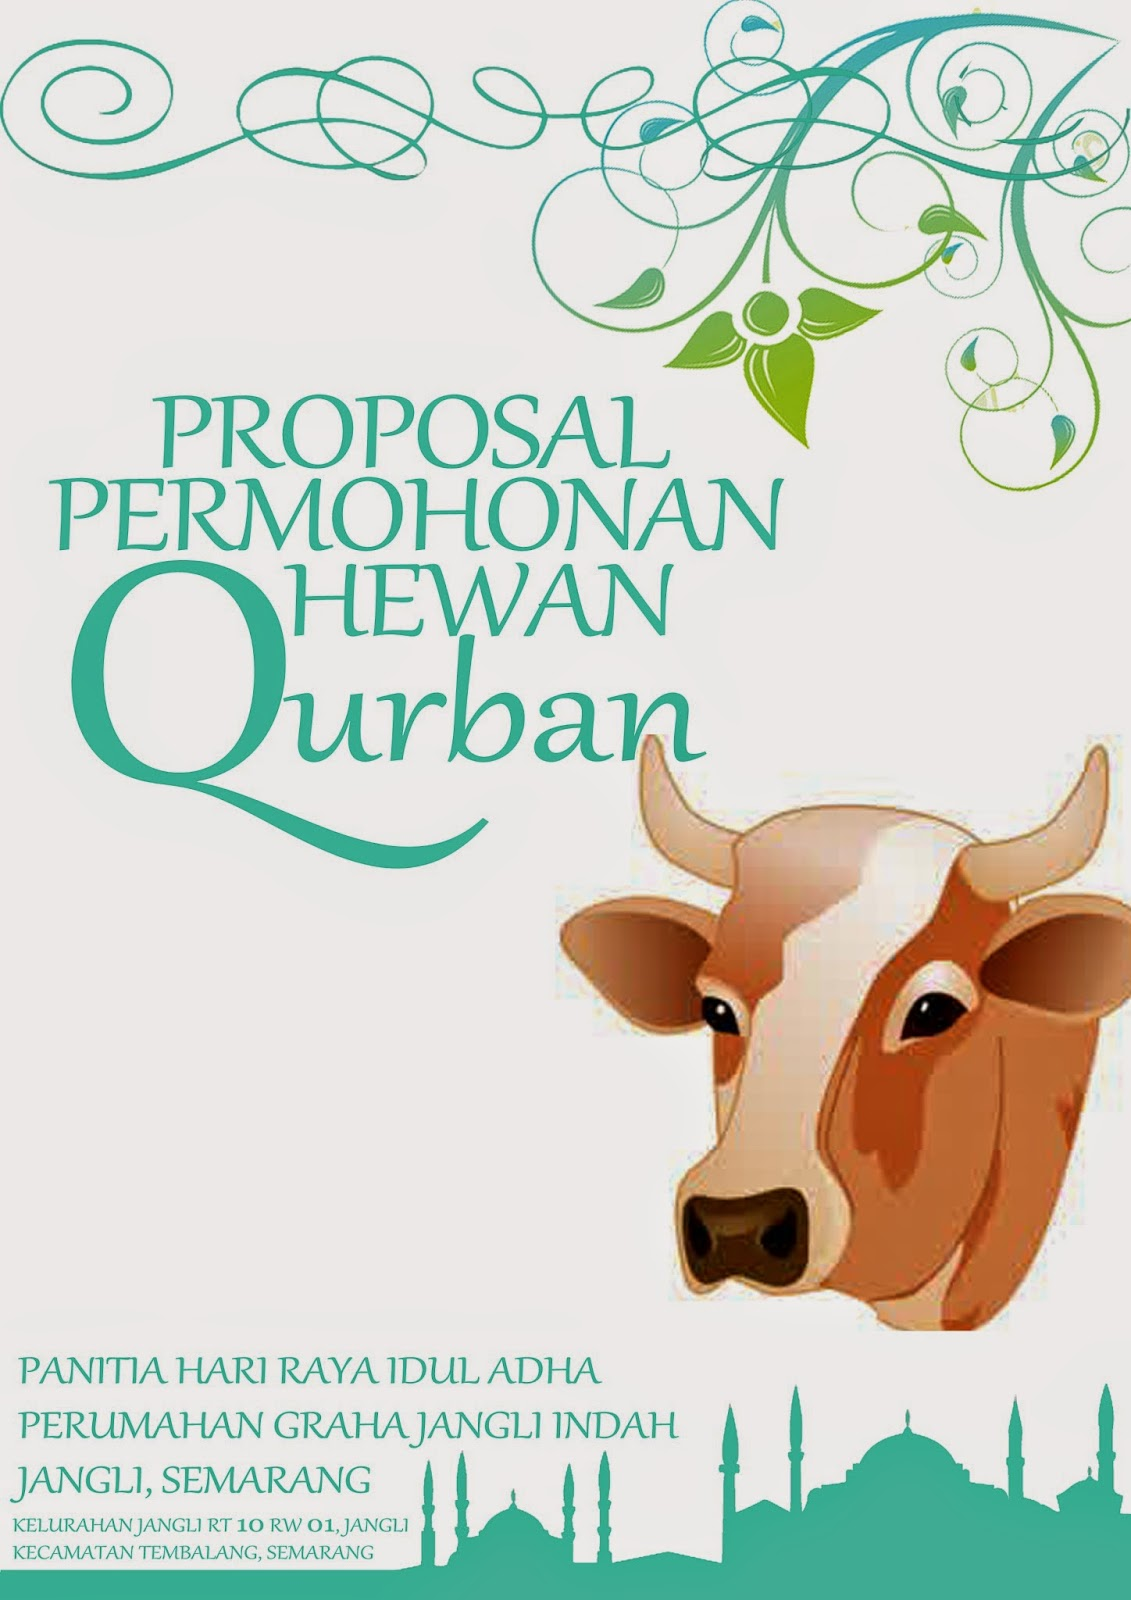 Proposal Panitia Qurban Sukadesain